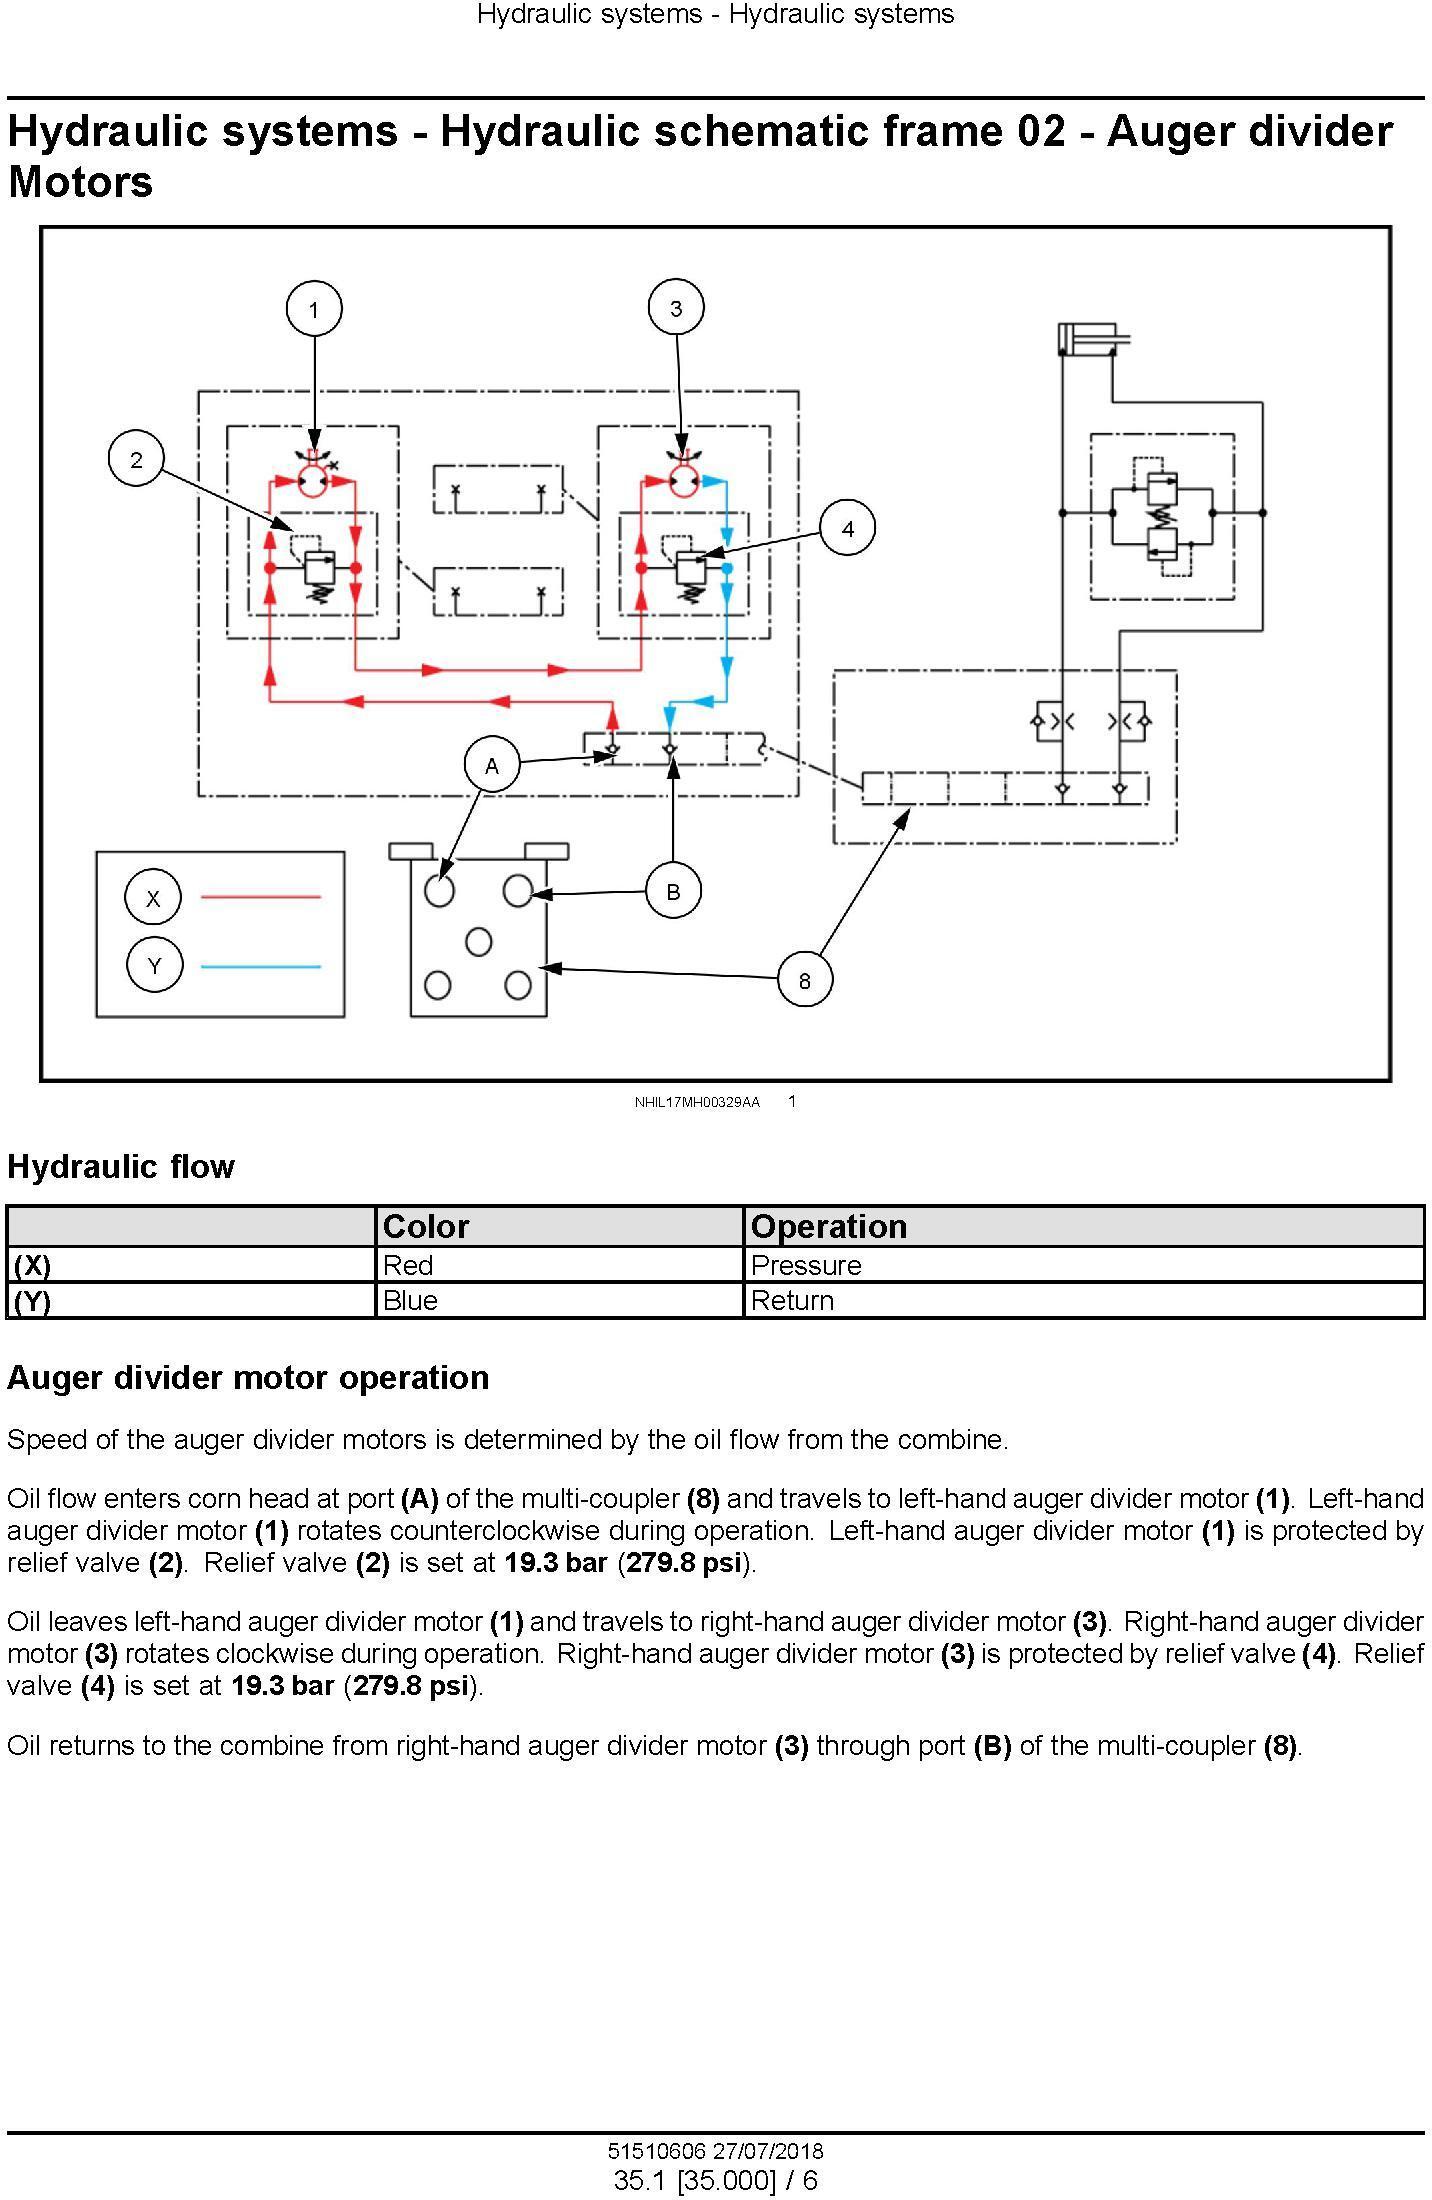 New Holland CornMaster 9208-22, 9212-20, 9212-22, 9216-20, 9216-22, 9218-20, 9218-22 Corn Header Service Manual - 3